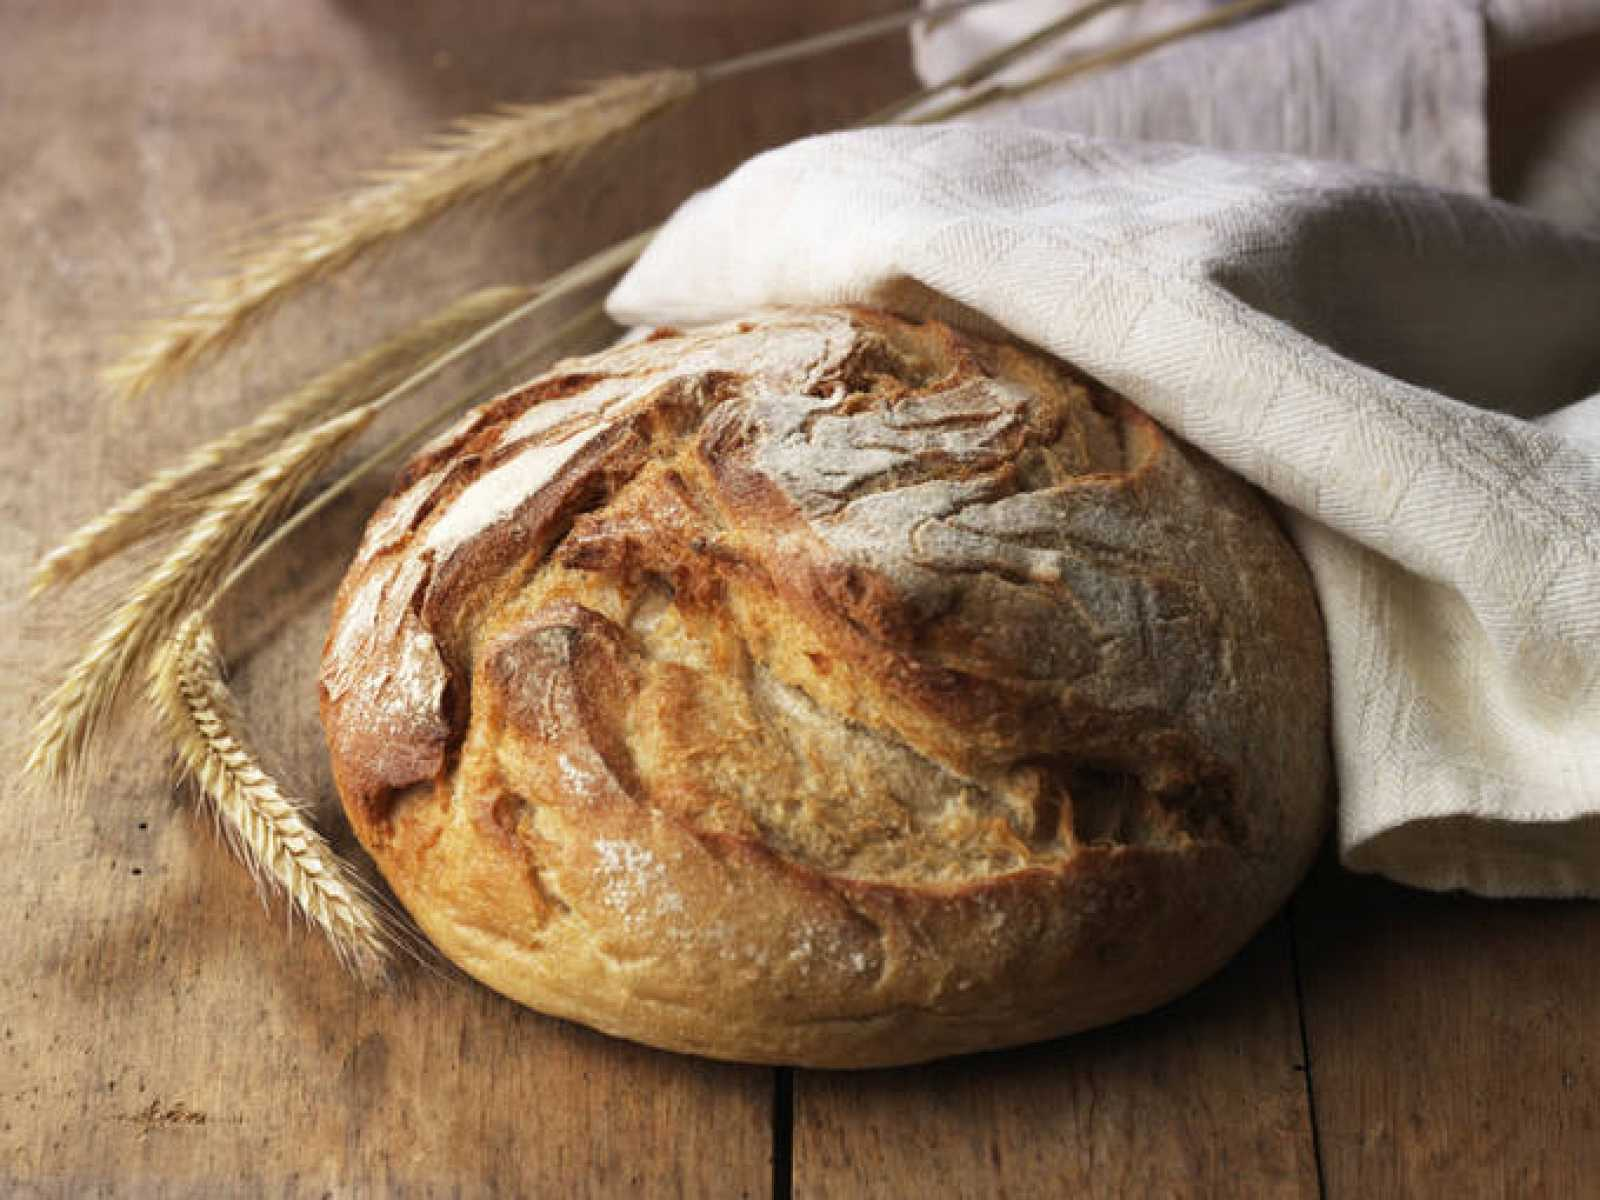 Pan de trigo recién horneado.